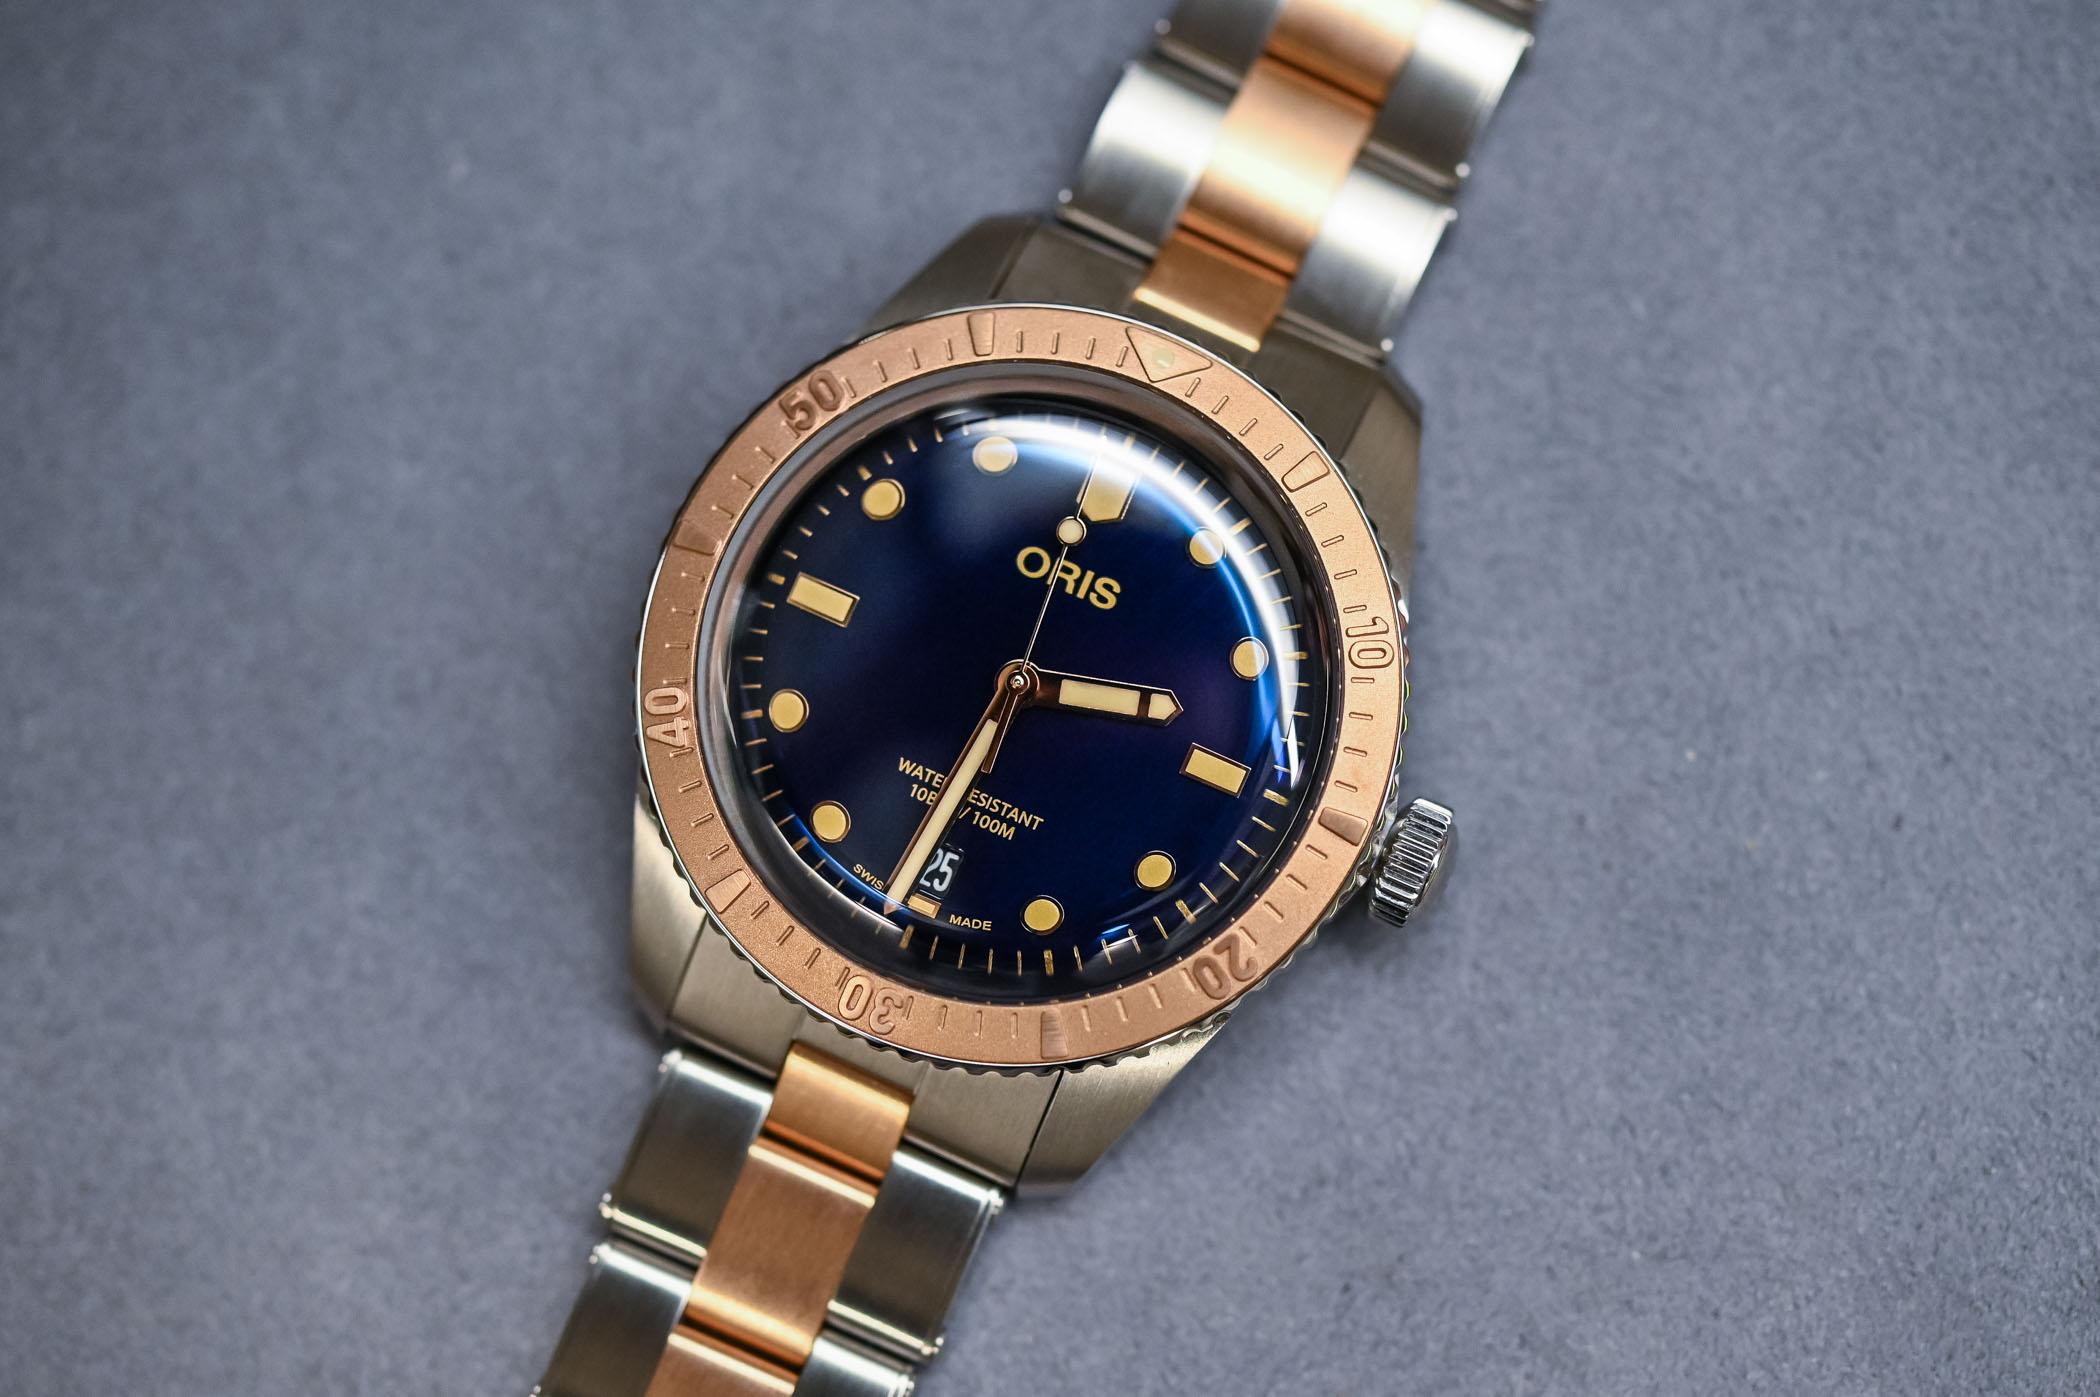 Oris-Divers-Sixty-Five-Bi-Colour-Bico-Steel-and-Bronze-Bracelet-baselworld-2019